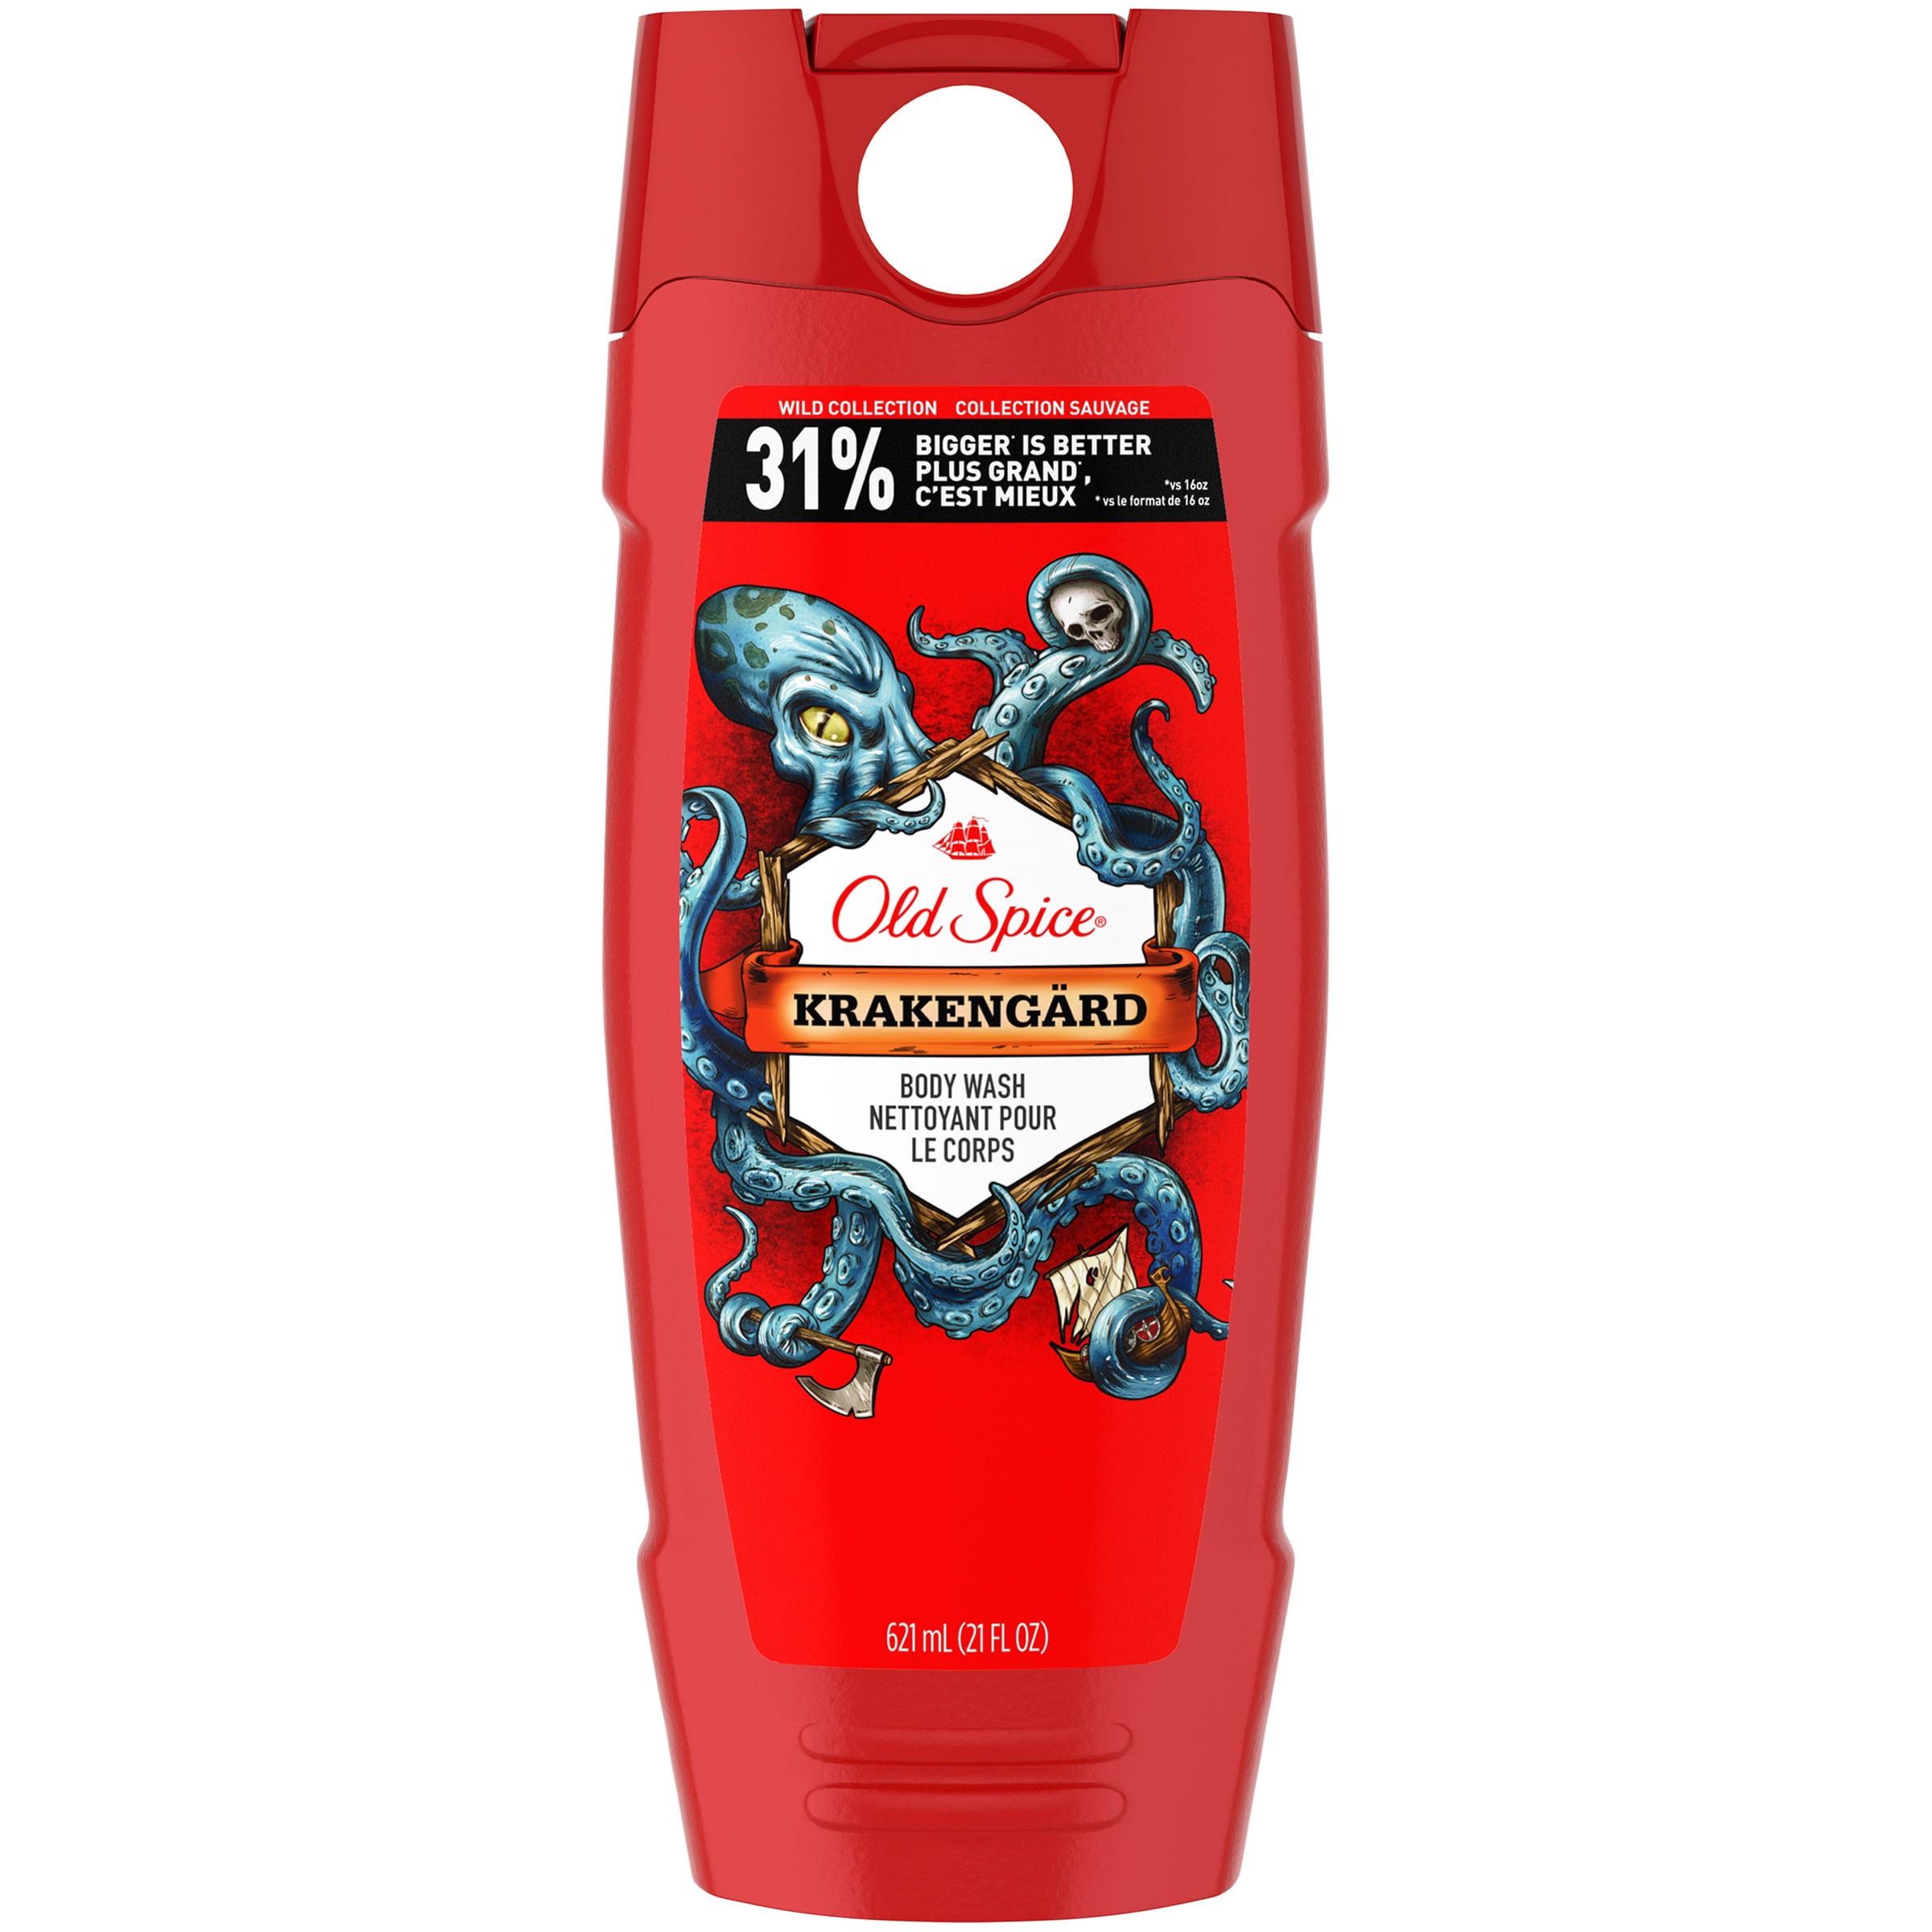 Old Spice Wild Krakengard Scent, Body Wash for Men, 21 Oz